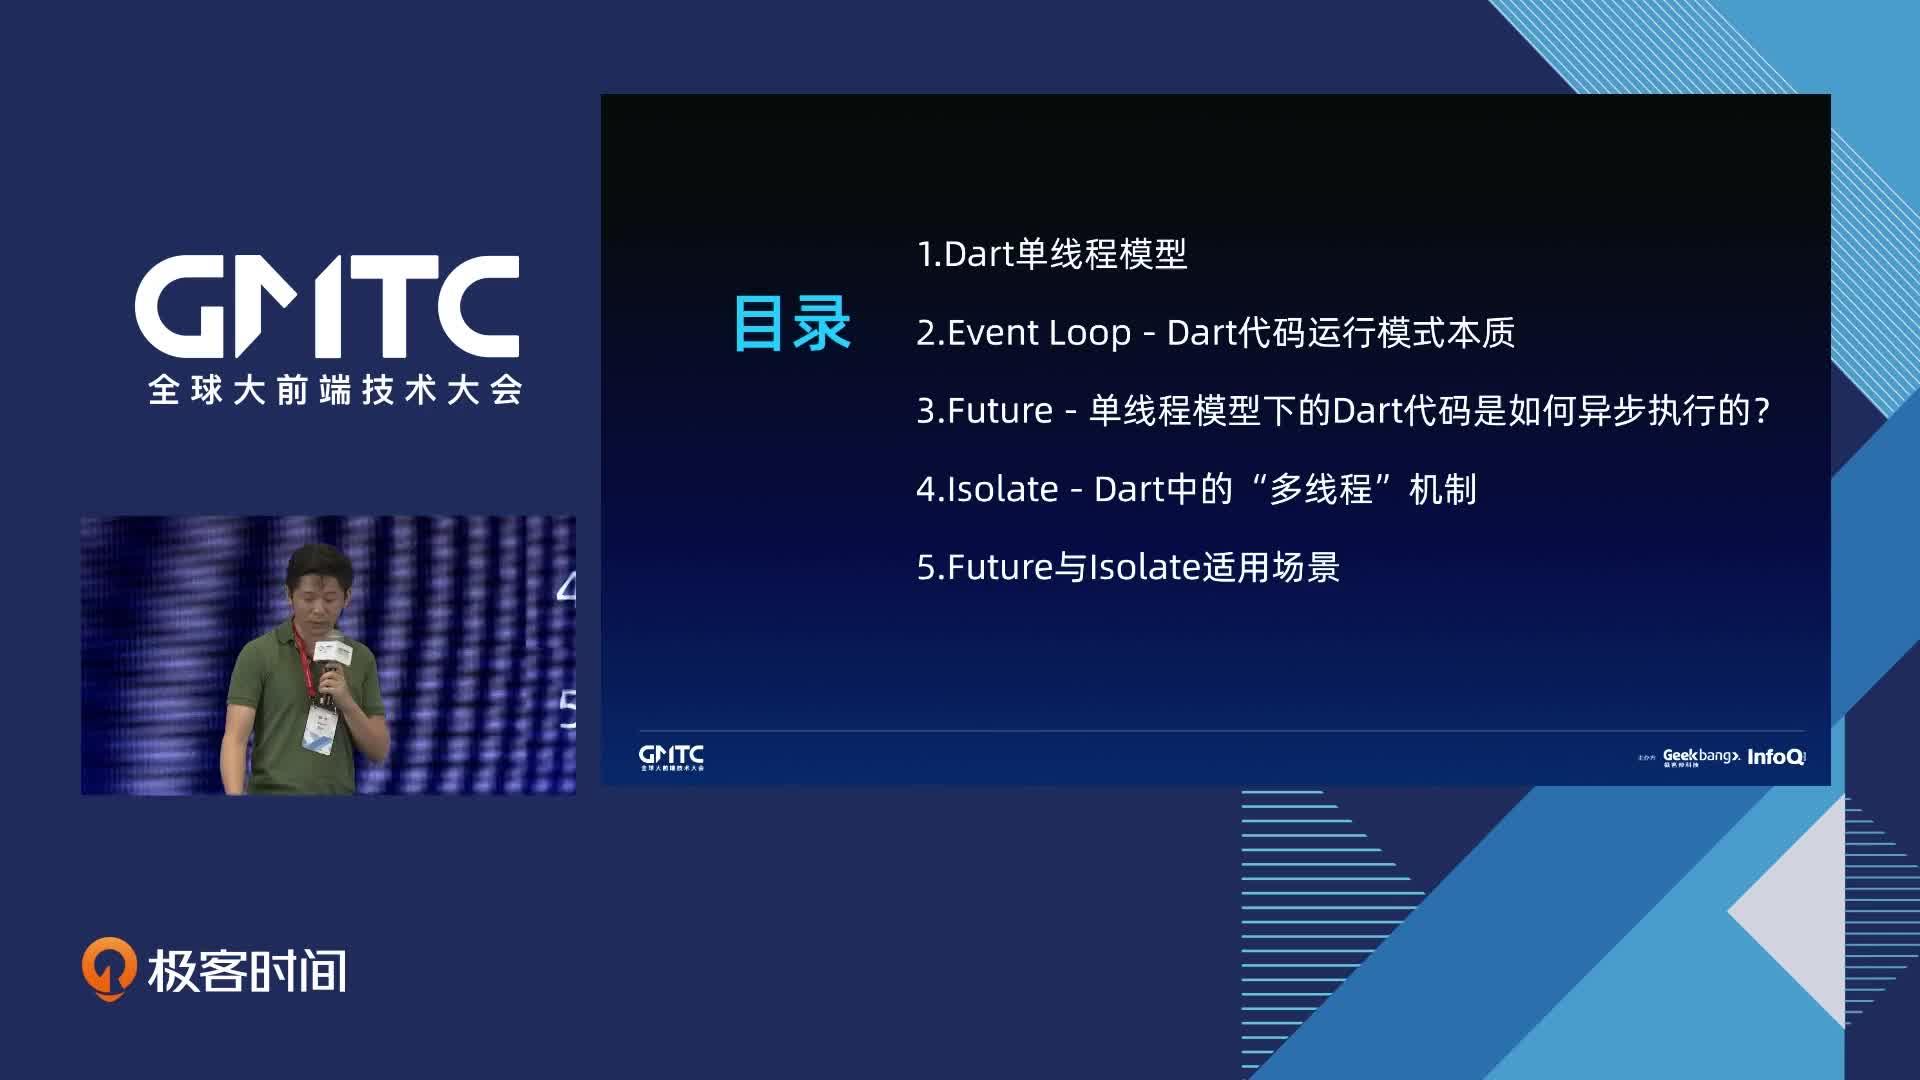 Event Loop、Future与Isolate - 单线程模型下的Dart异步编程模式丨GMTC